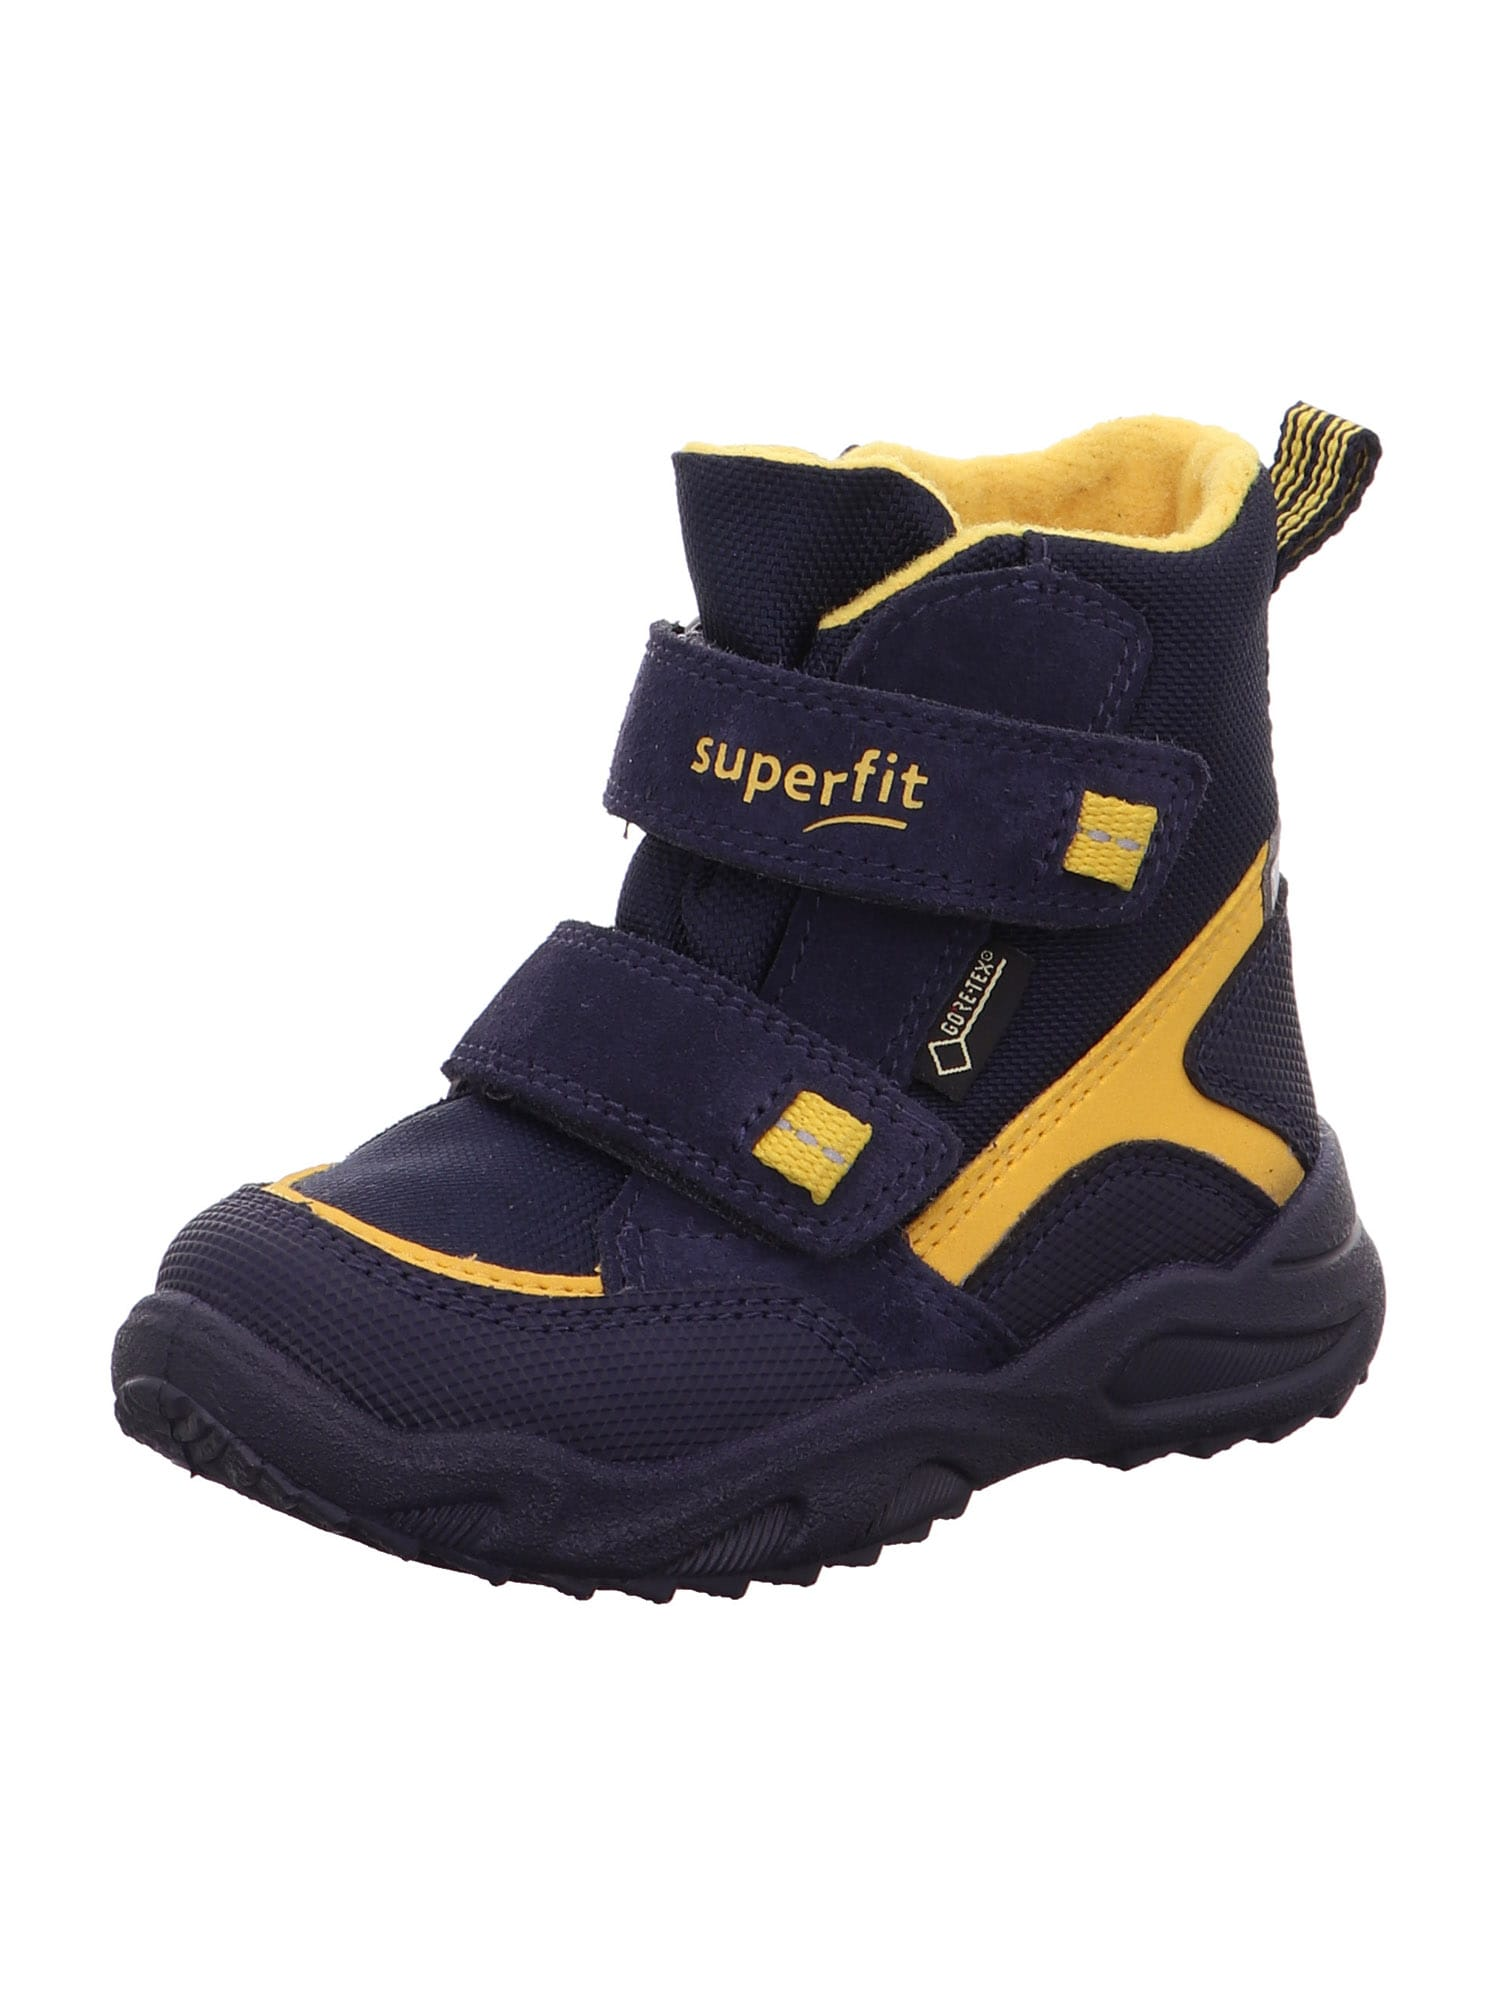 SUPERFIT Auliniai batai su kulniuku 'GLACIER' geltona / nakties mėlyna